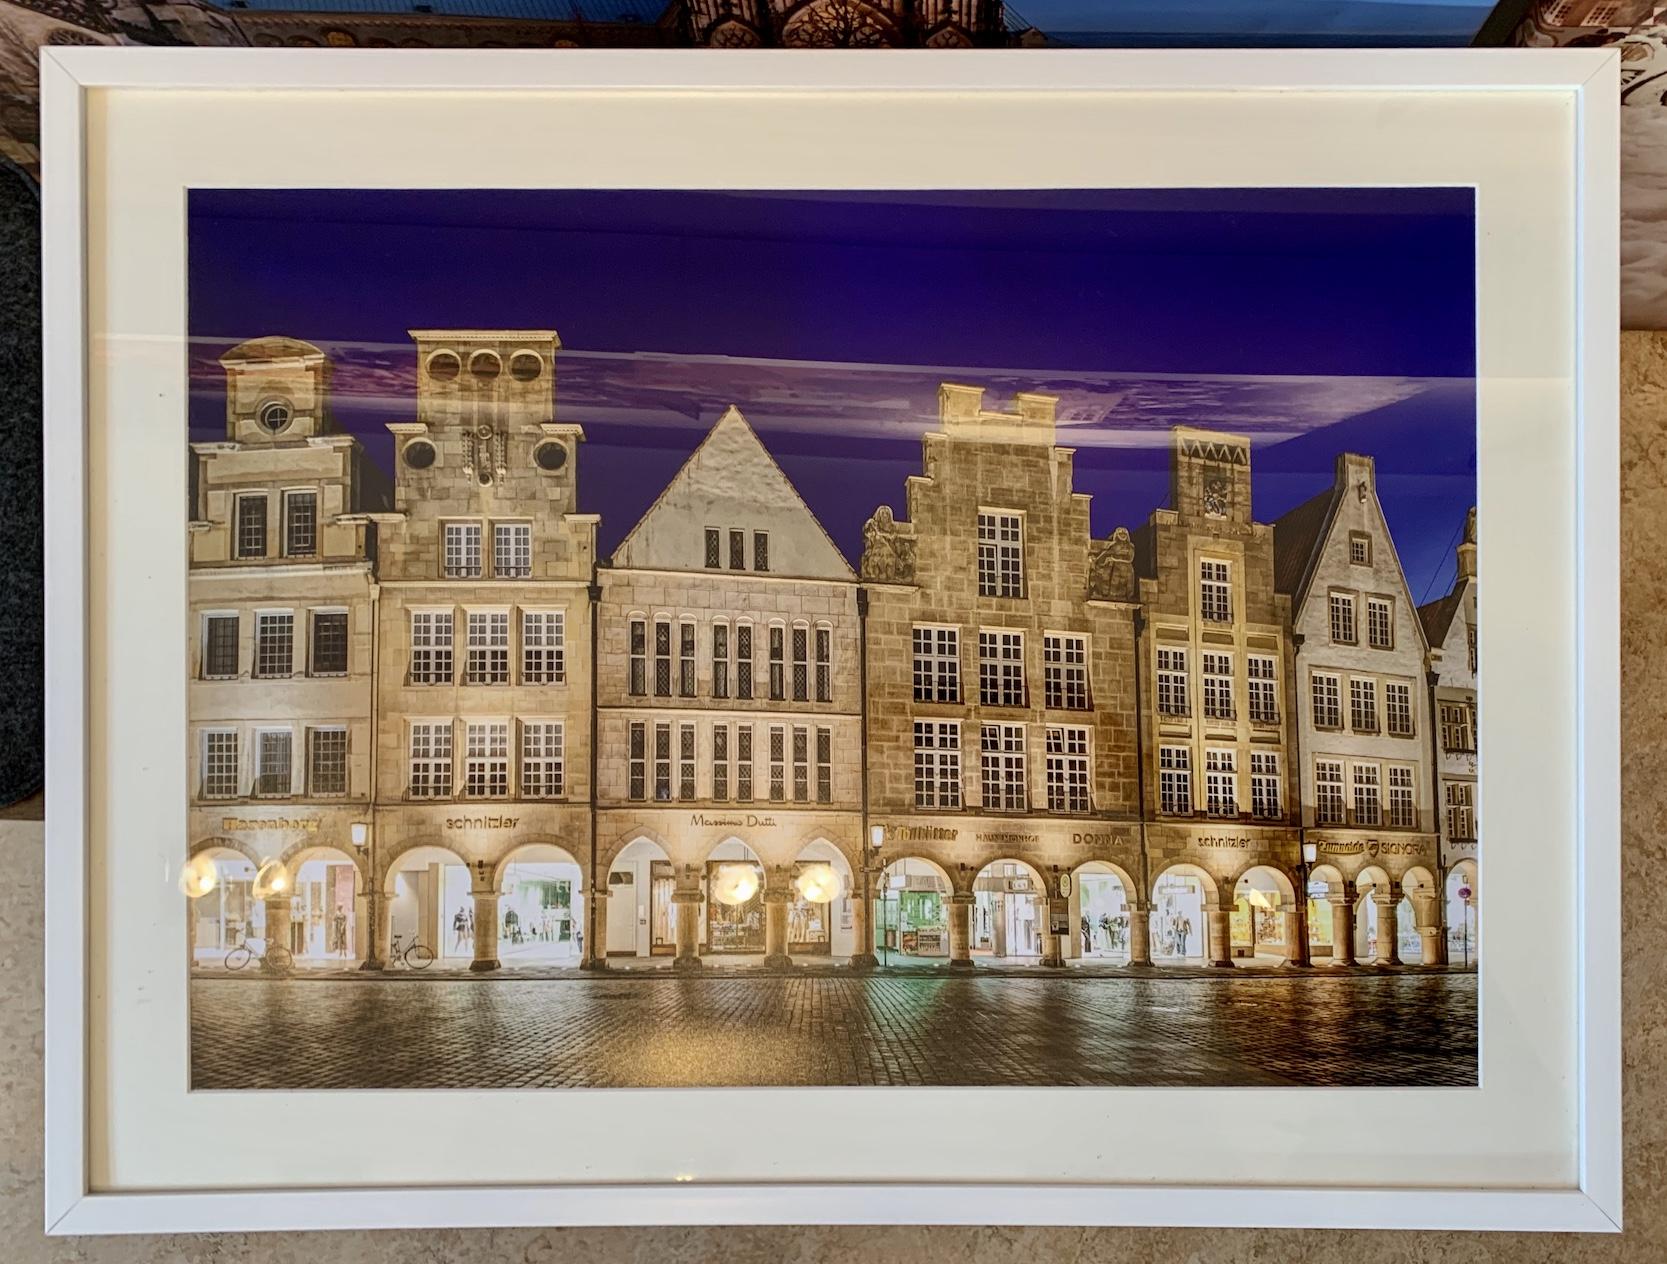 80x60 - Foto im Passepartout mit Rahmen (Diverse Farben & Motive)